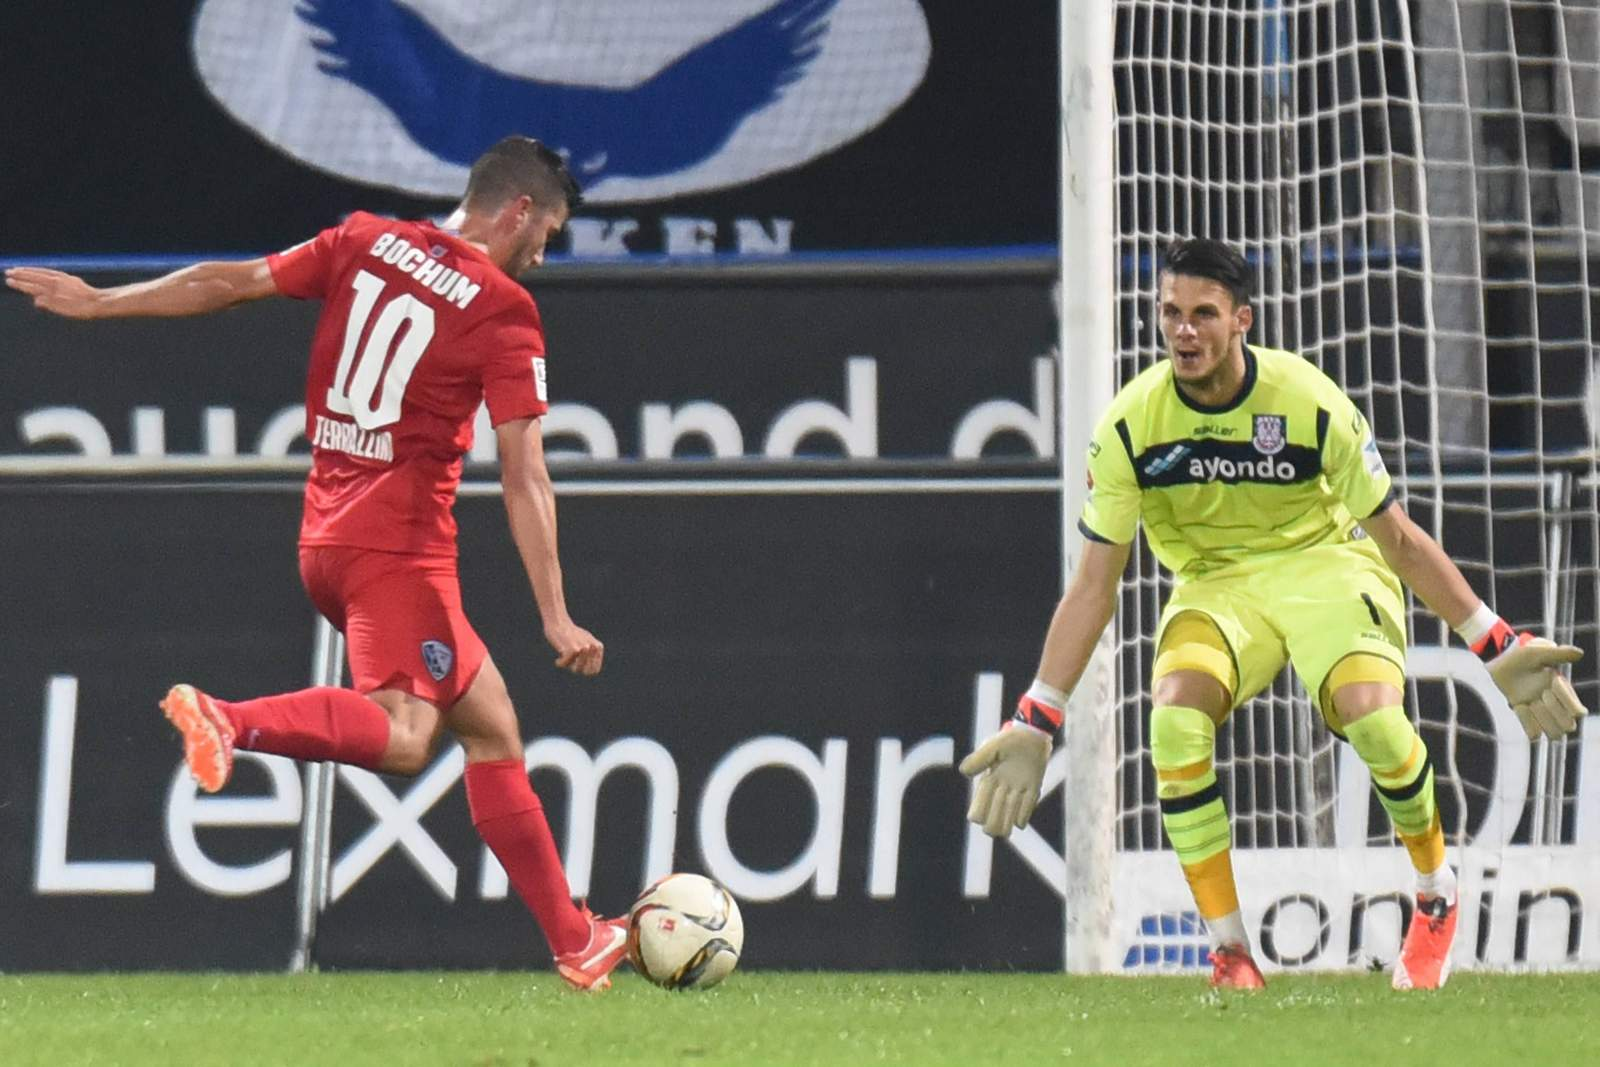 Gewinnt Marco Terrazzino das Duell gegen Andre Weis? Jetzt Prognose zu Bochum vs FSV Frankfurt lesen